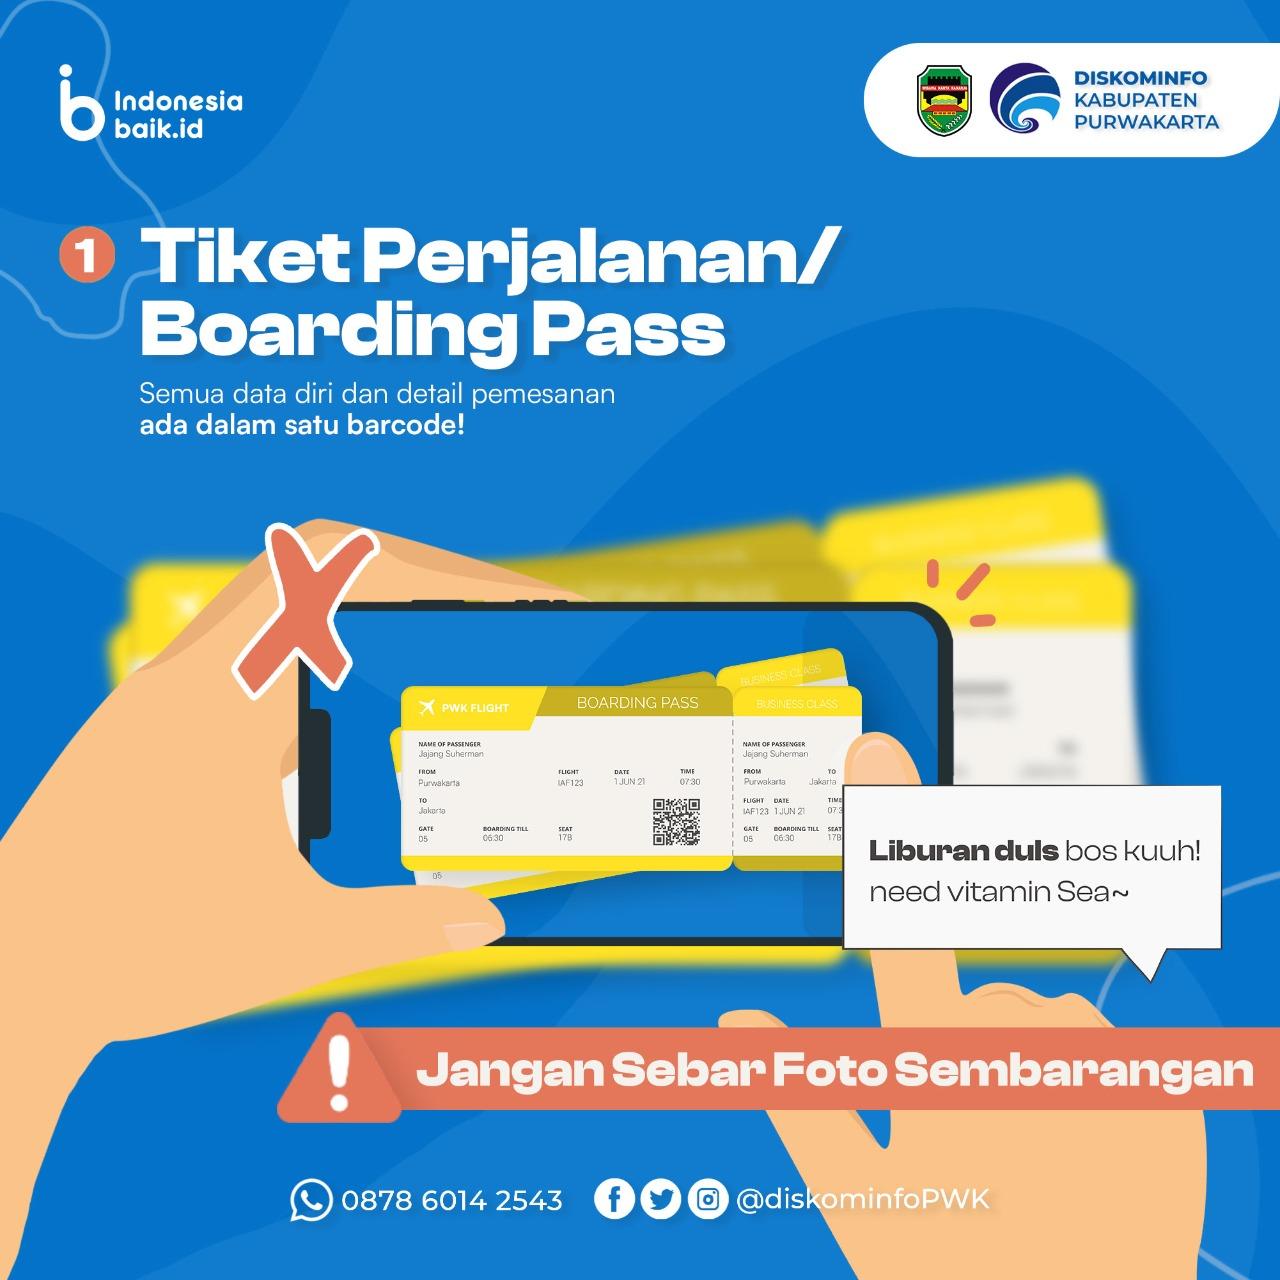 Tiket Perjalanan/Boarding Pass